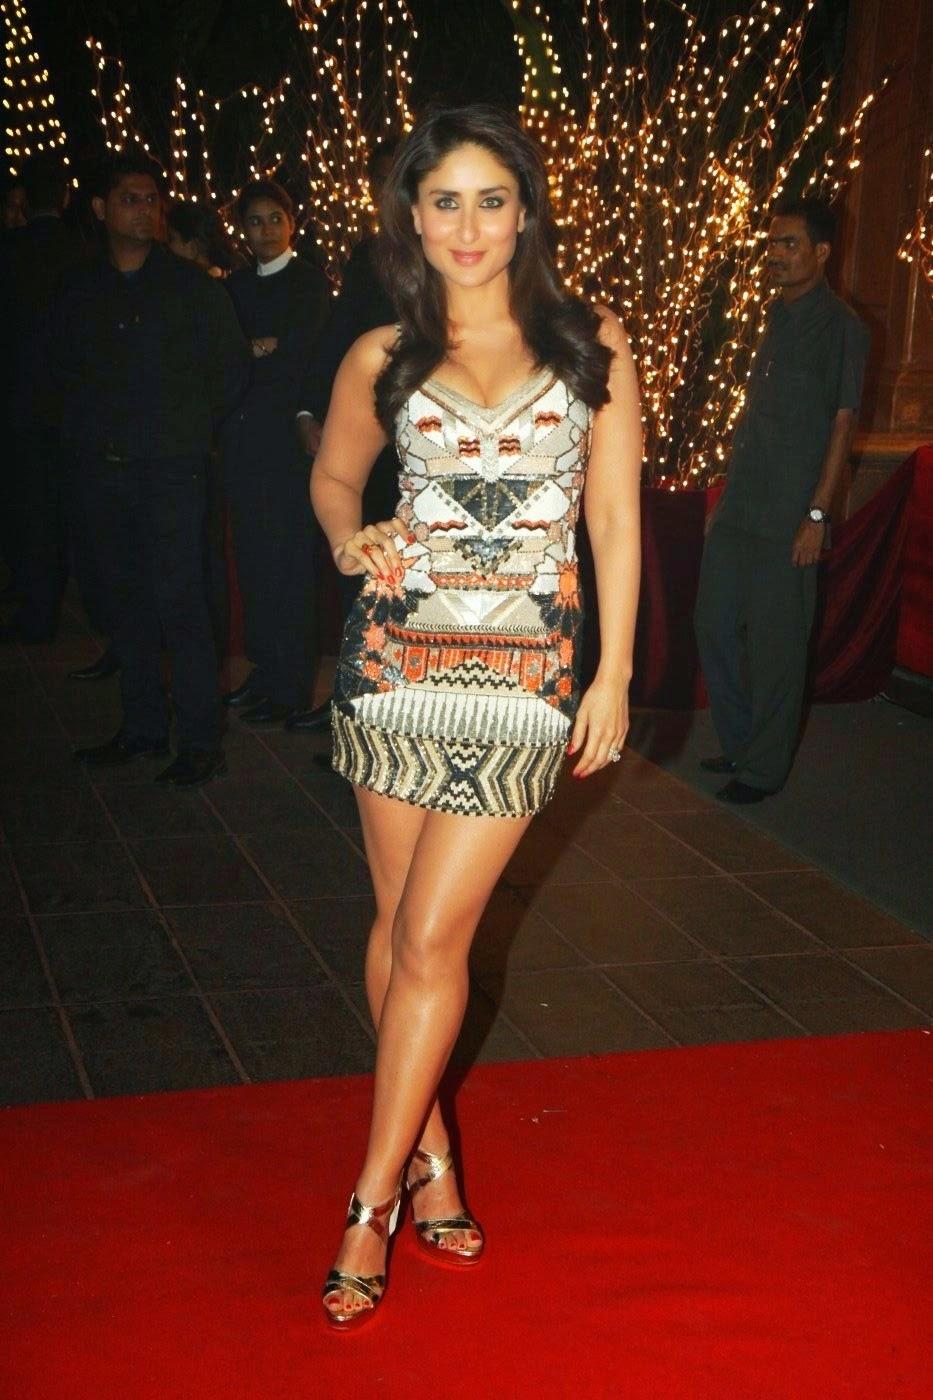 kareena kapoor high heels lonbig thunder tall legs hot exposing legs thunder thighs through her transparent mini skirt